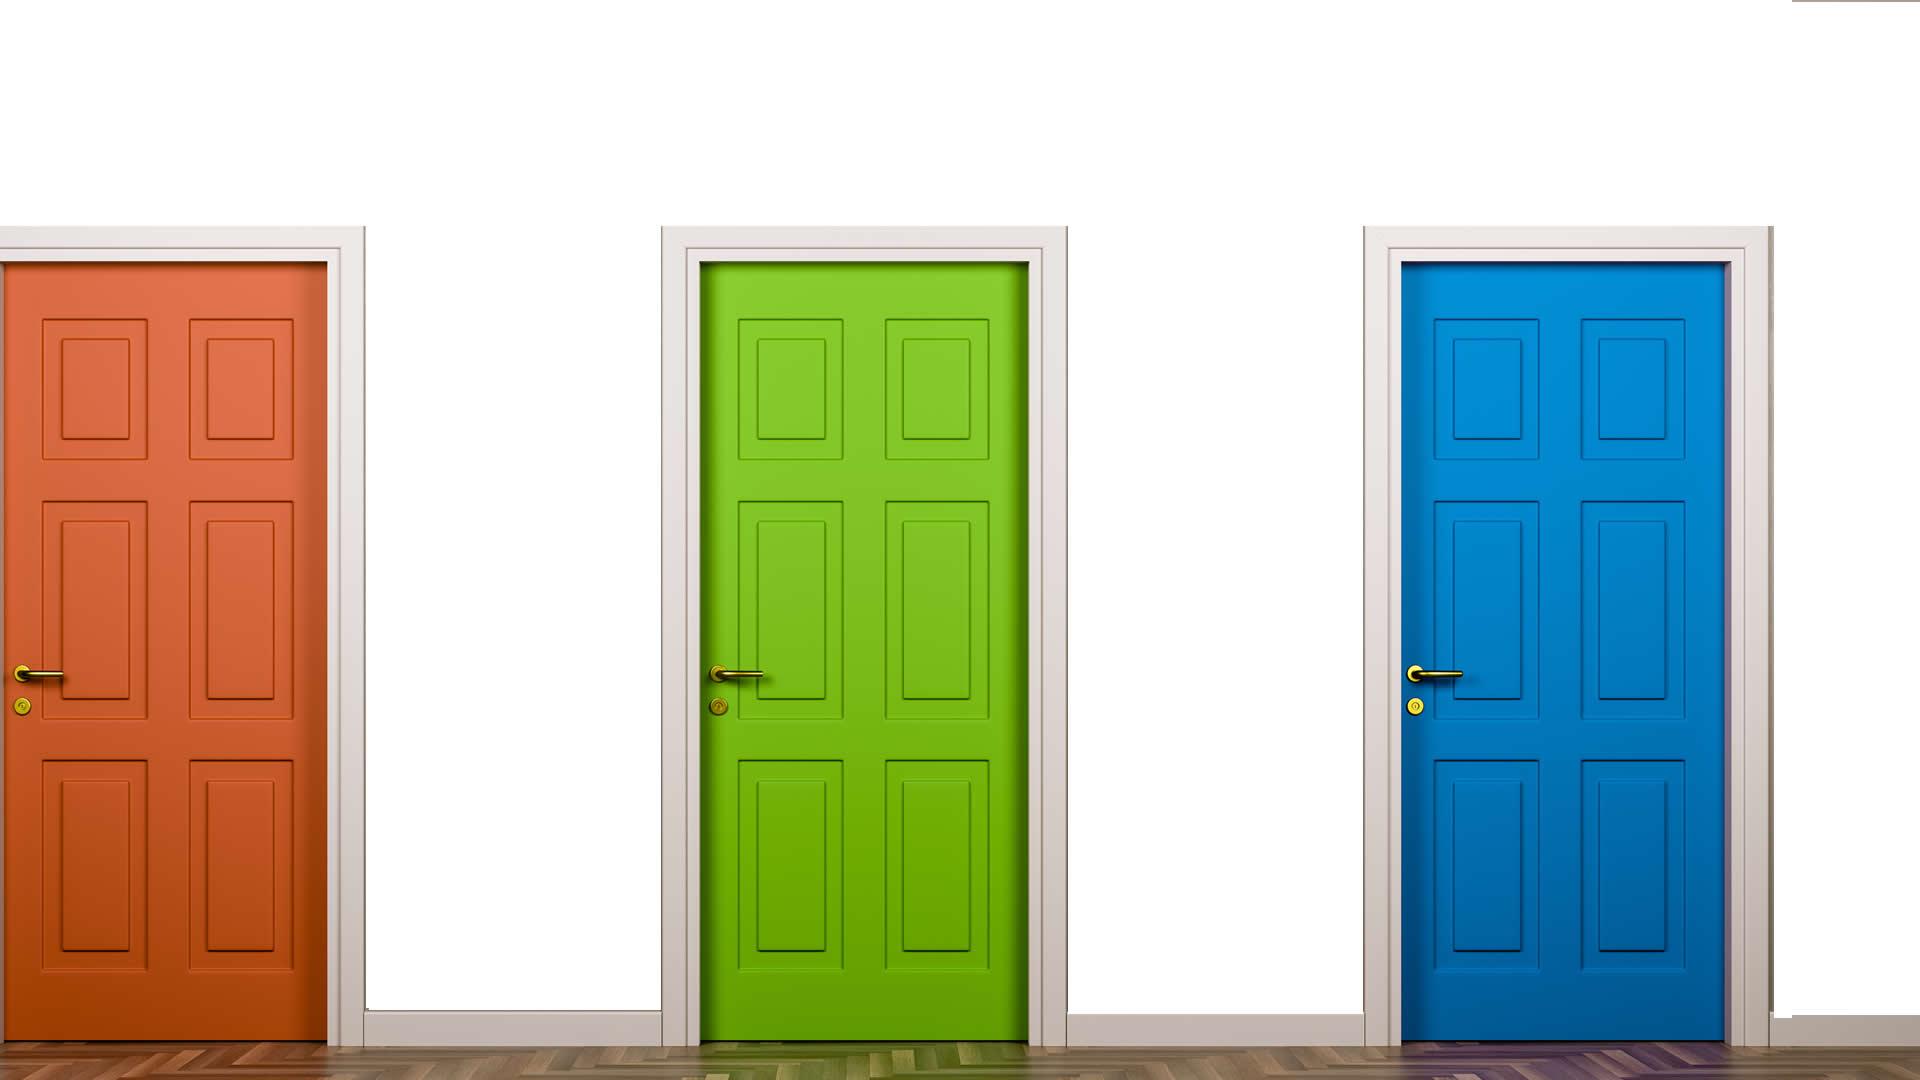 Porte,nuoro sassari,nuoro,infissi,olbia, Porte, finestre, pavimenti in LVT | Nuoro-Sassari, Nuovalegno & Omniaplan